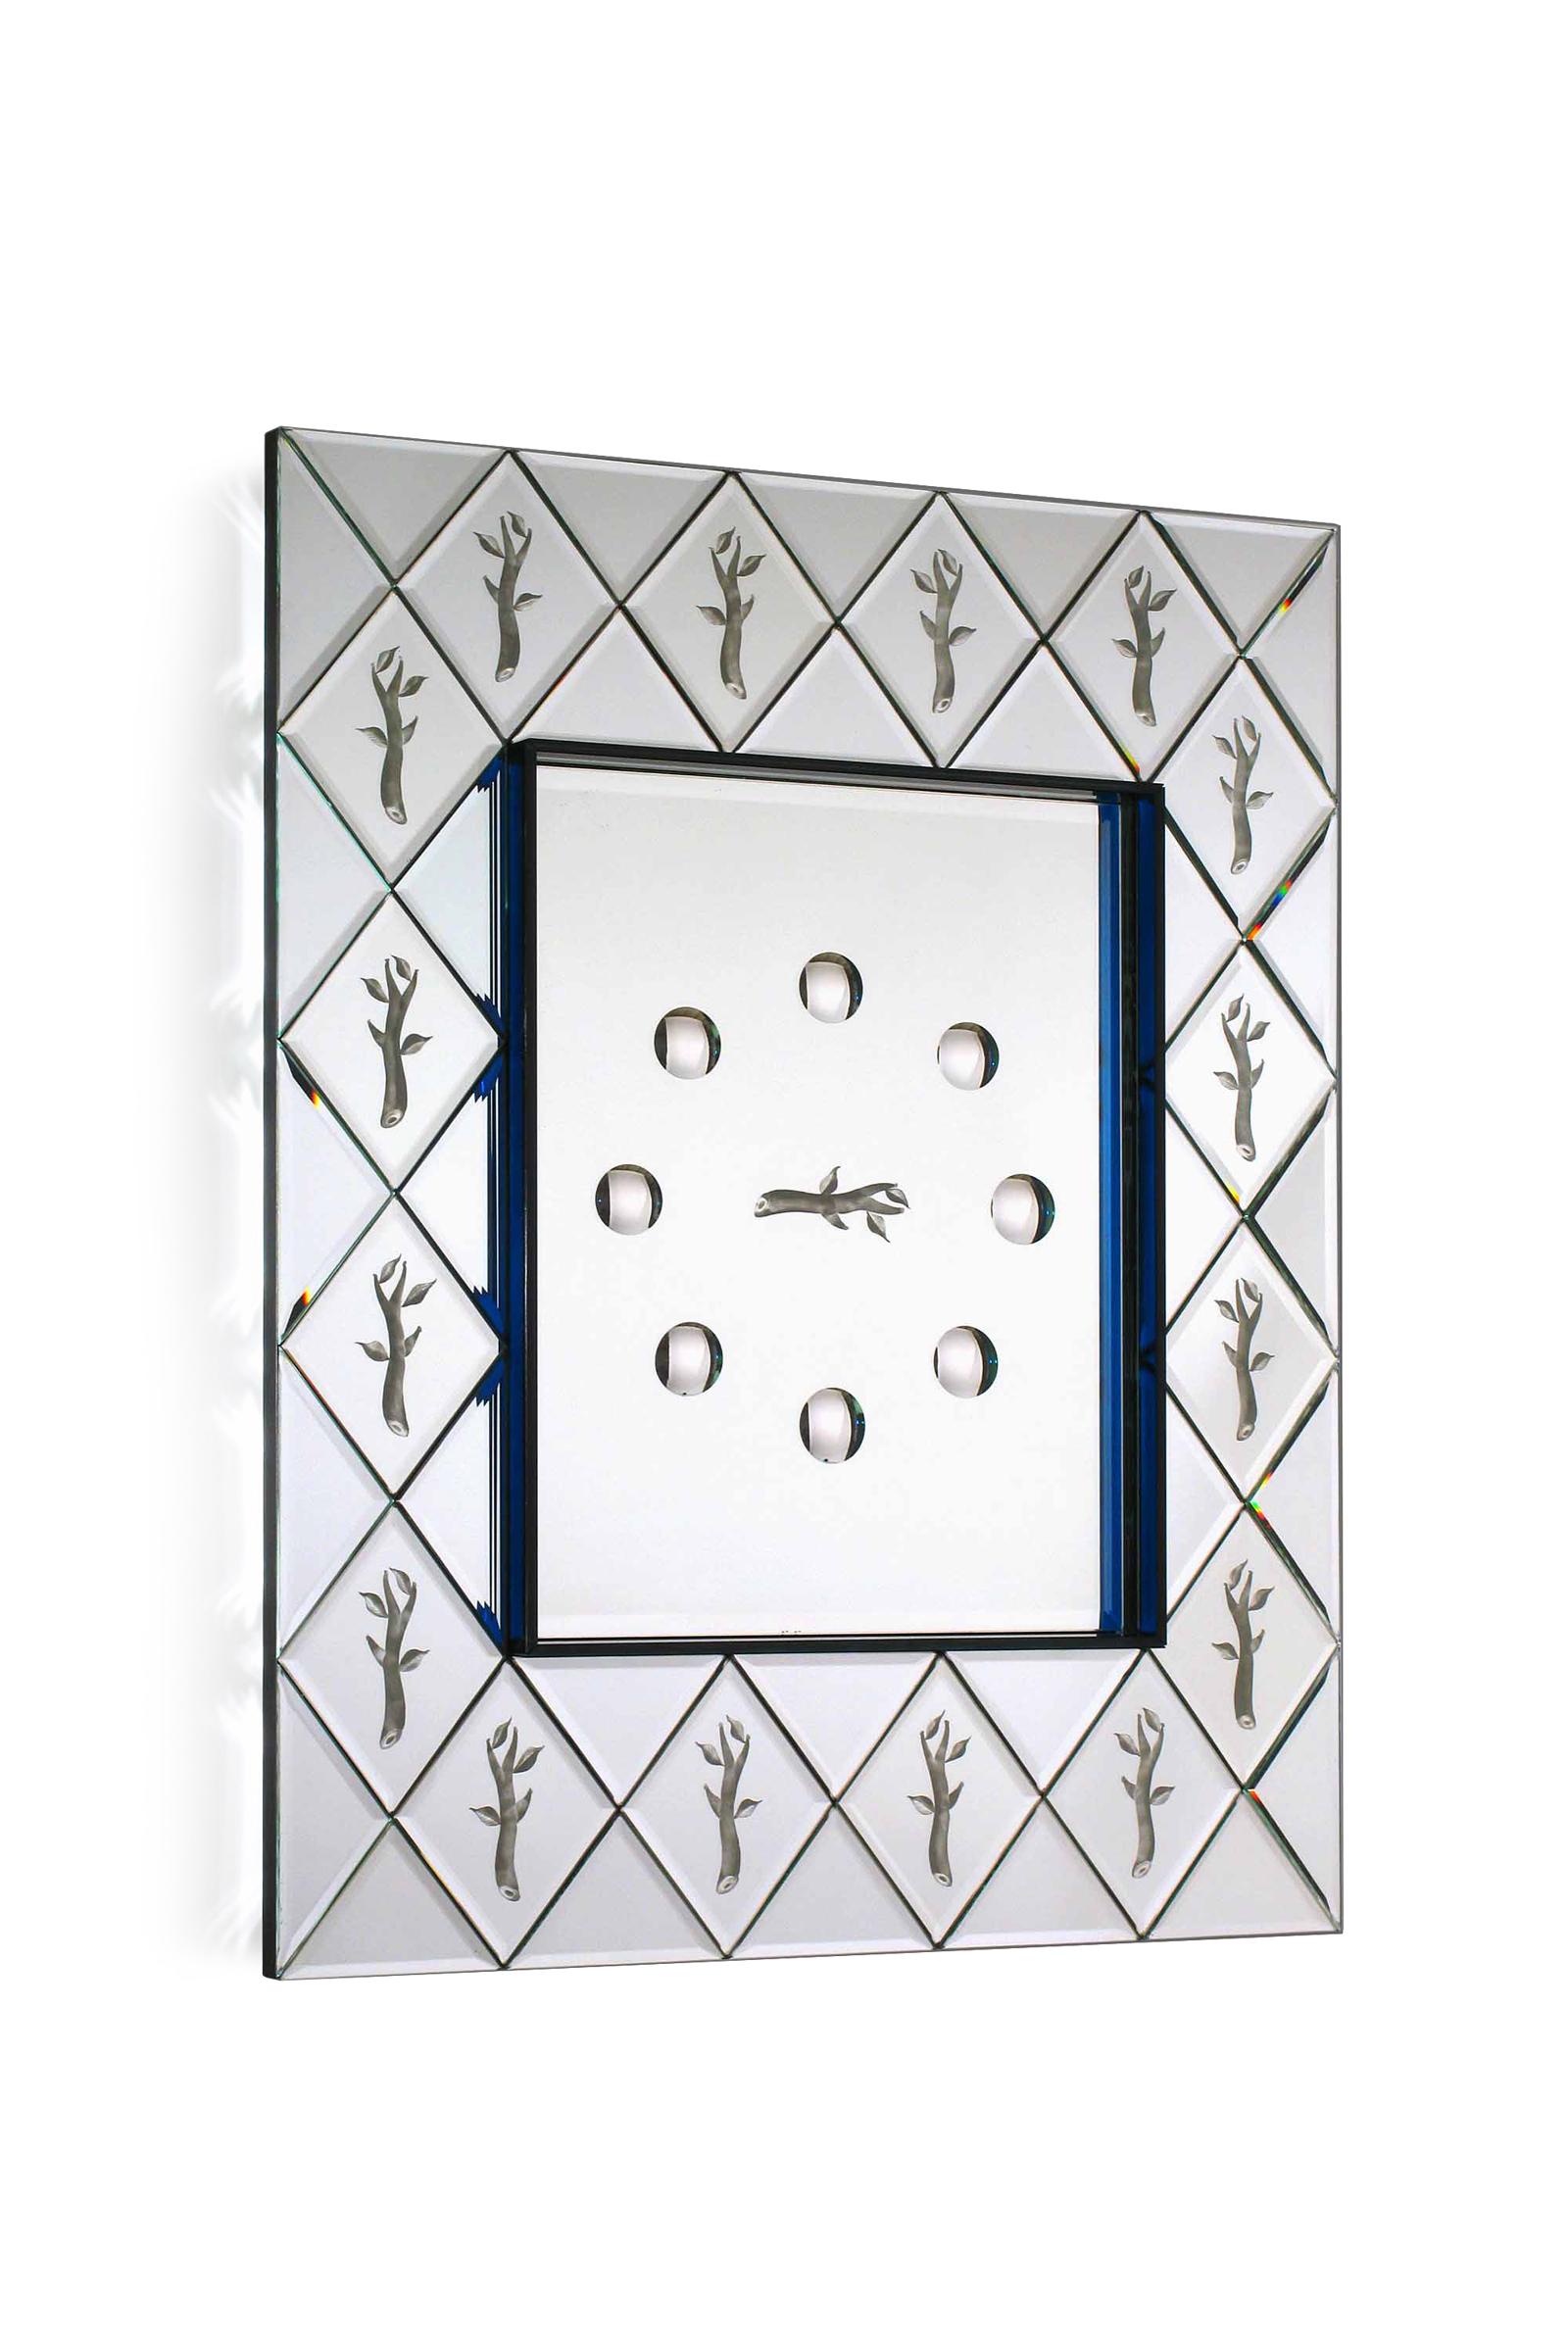 caigo-mirror-miroir-olivier-gagnere-veronese-1.jpg